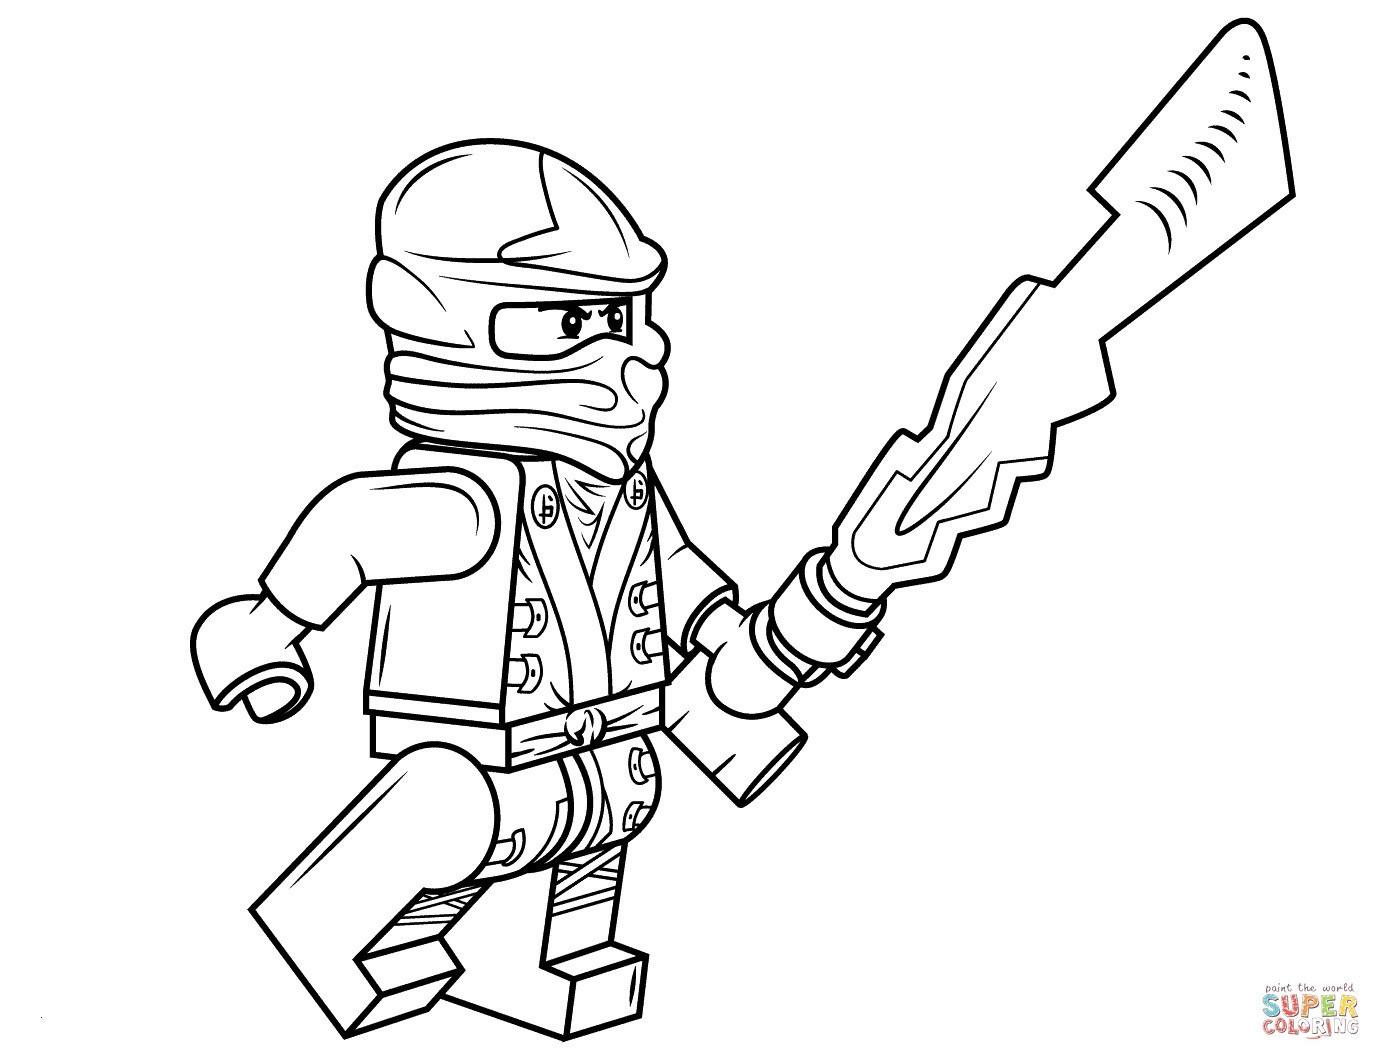 Ausmalbild Ninjago Lloyd Einzigartig Ninjago Cole Ausmalbilder Inspirational Malvorlagen Igel Bild